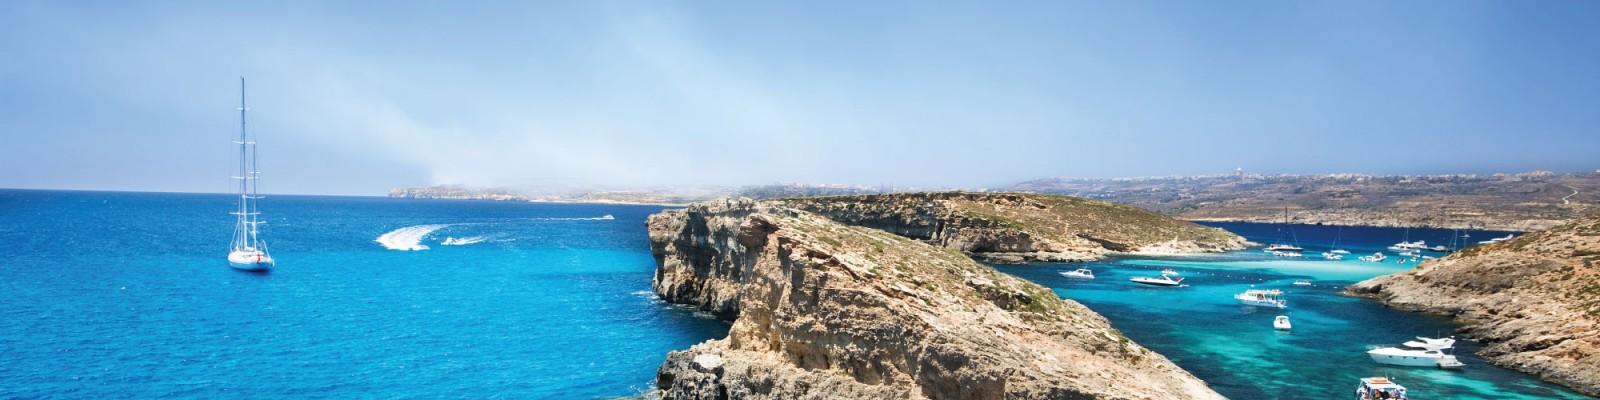 Tenrag Yacht Charter: Malta